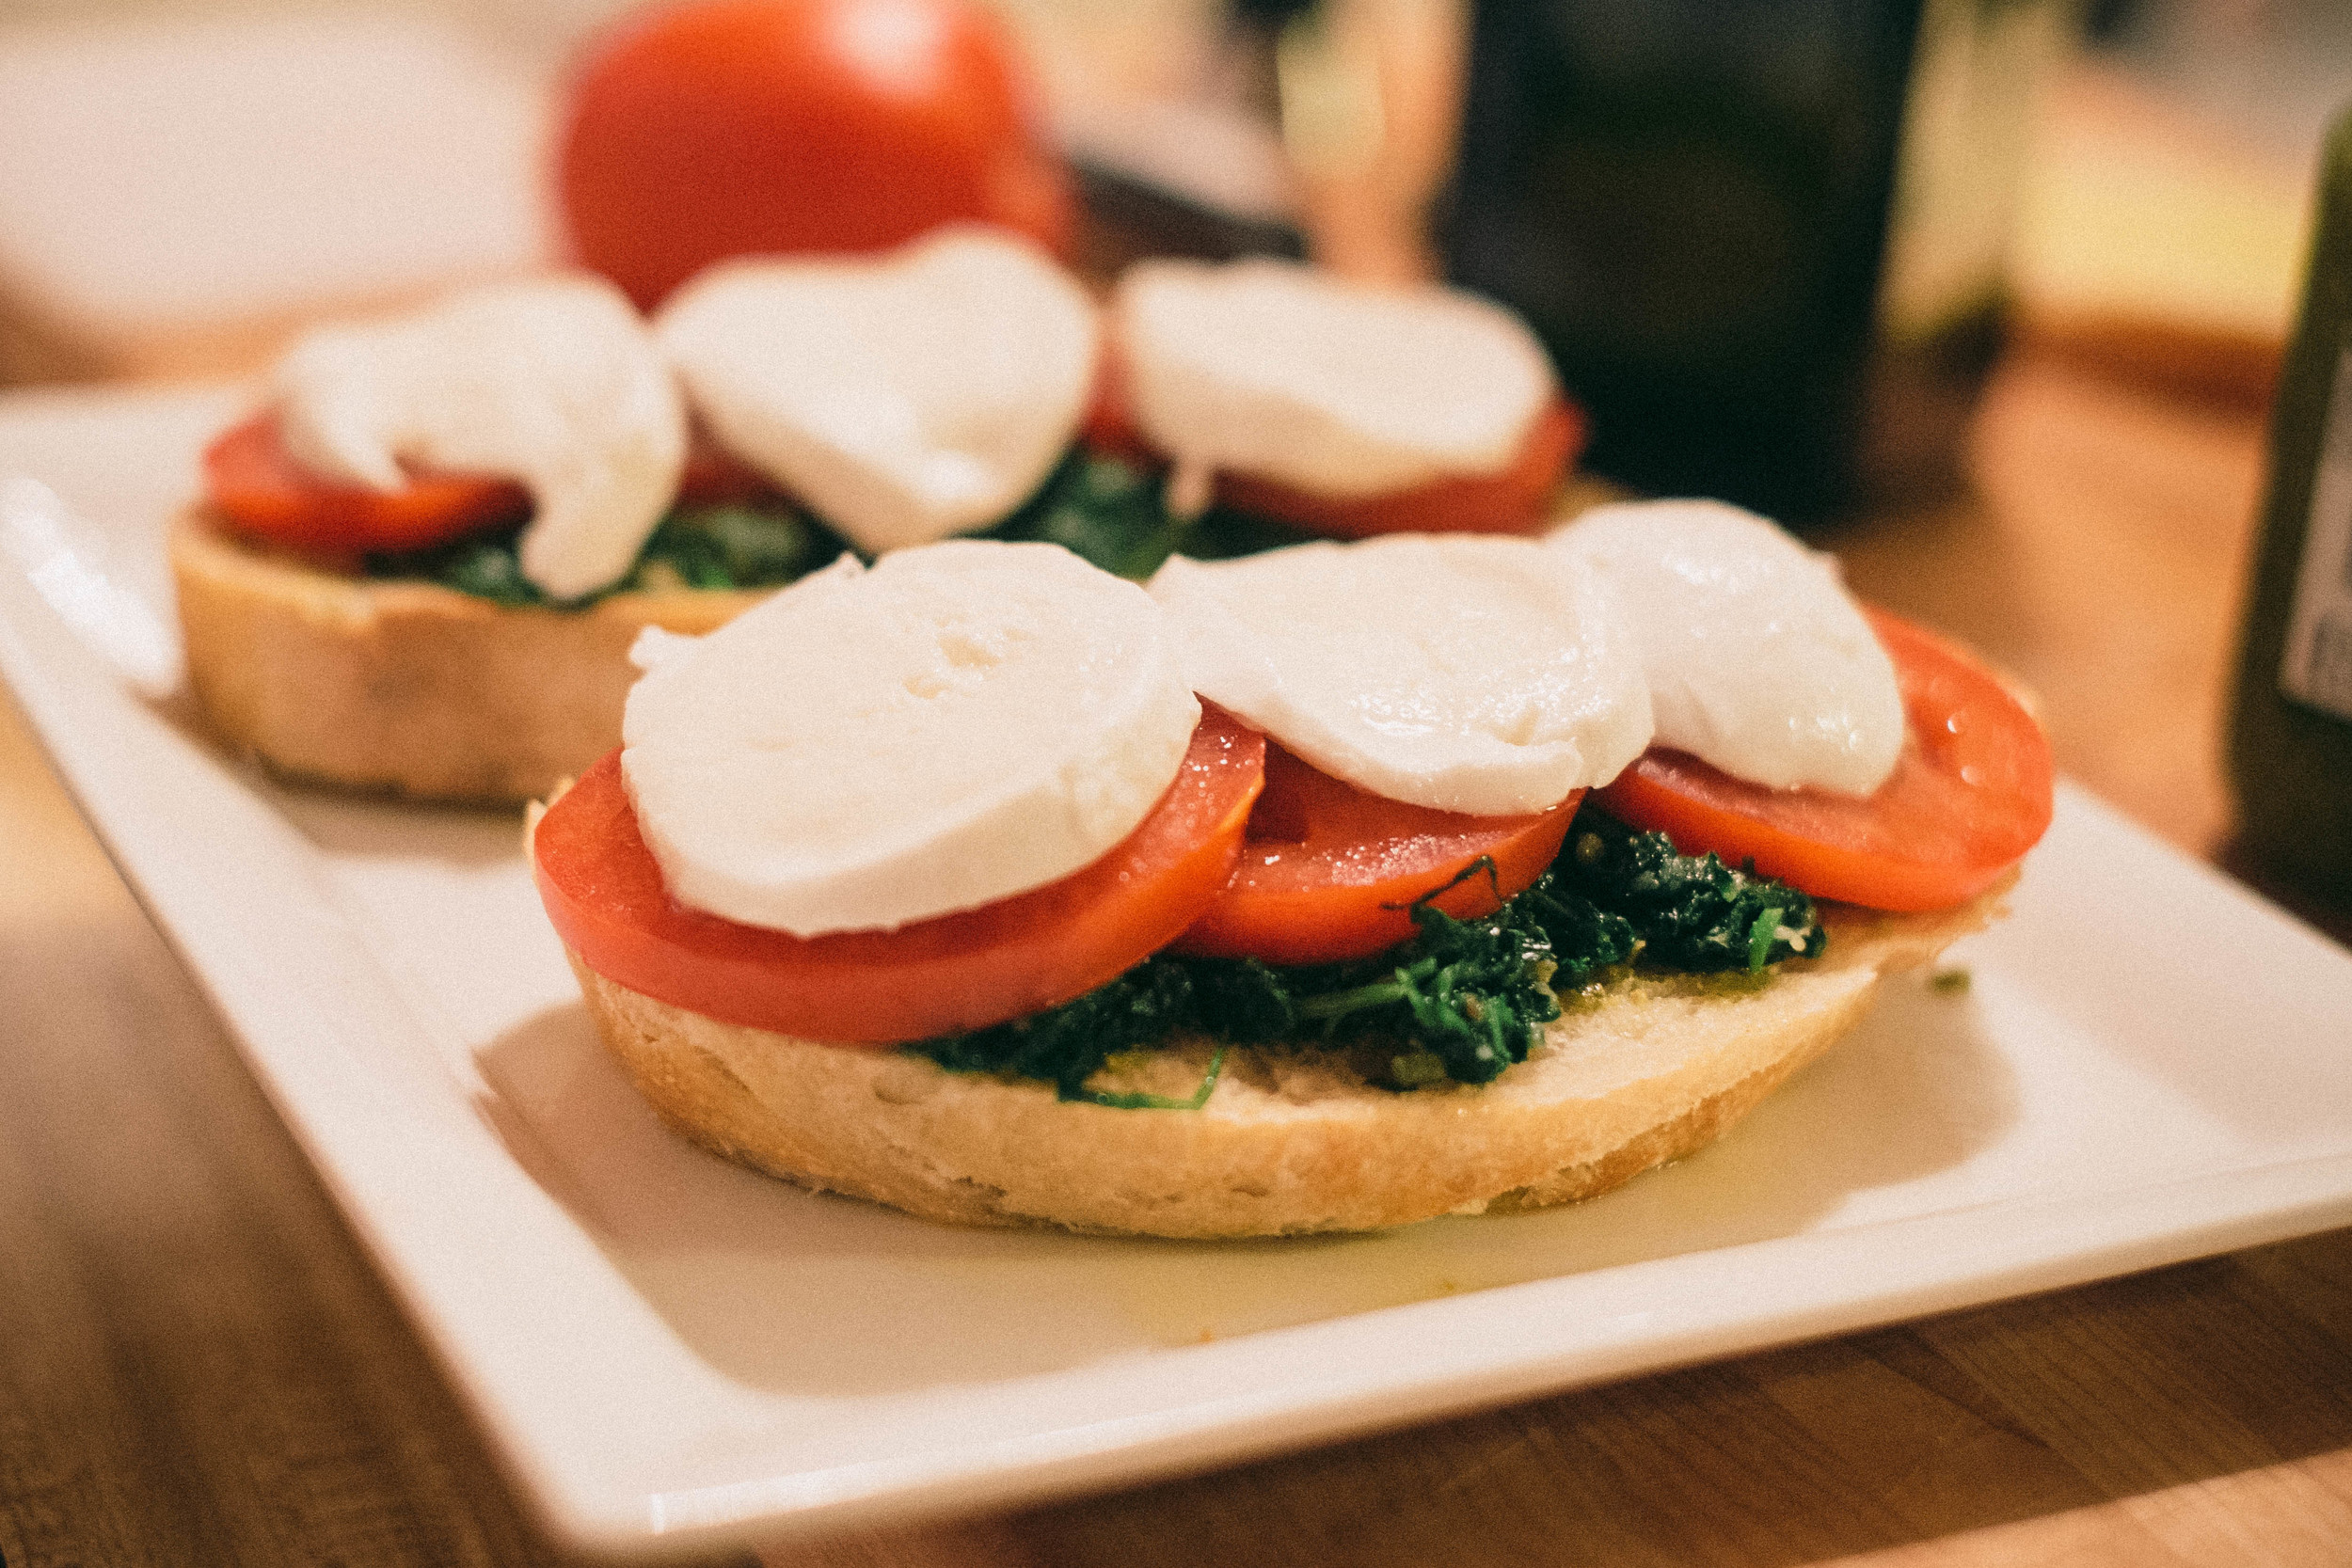 Tomato, kale and mozzarella sandwich with pesto before hitting the panini grill